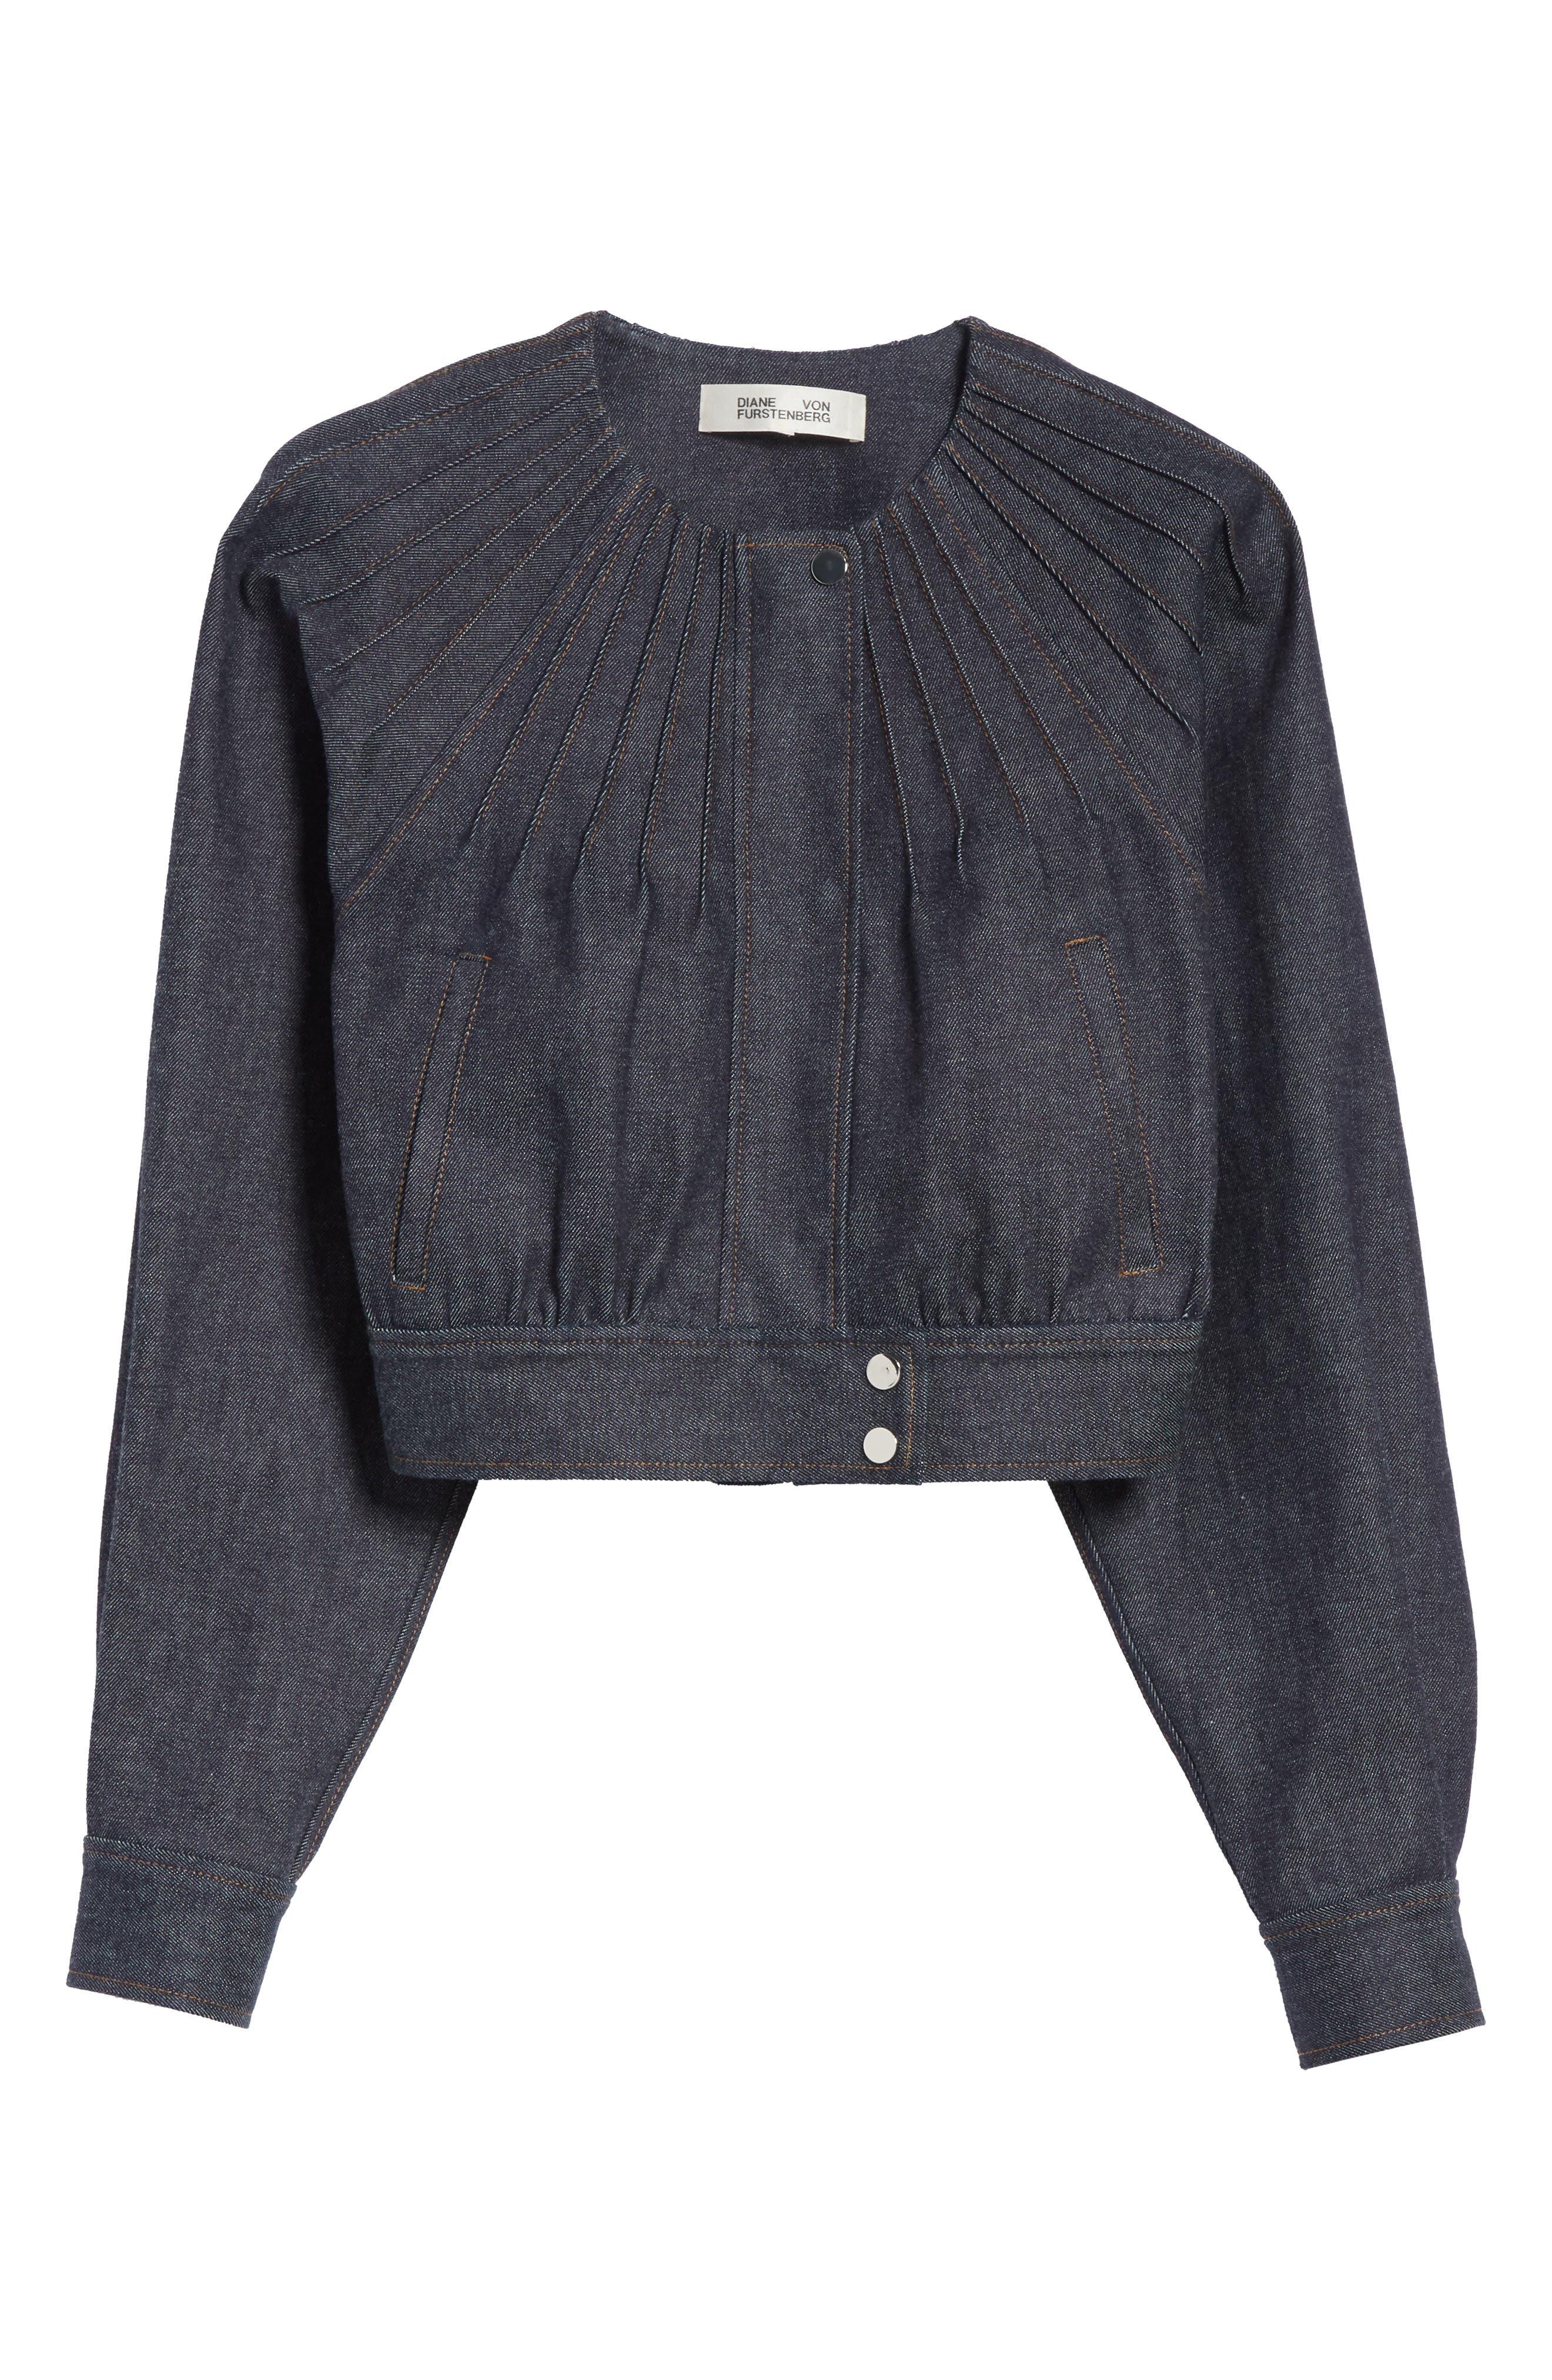 Diane von Furstenberg Pintuck Denim Jacket,                             Alternate thumbnail 7, color,                             Indigo